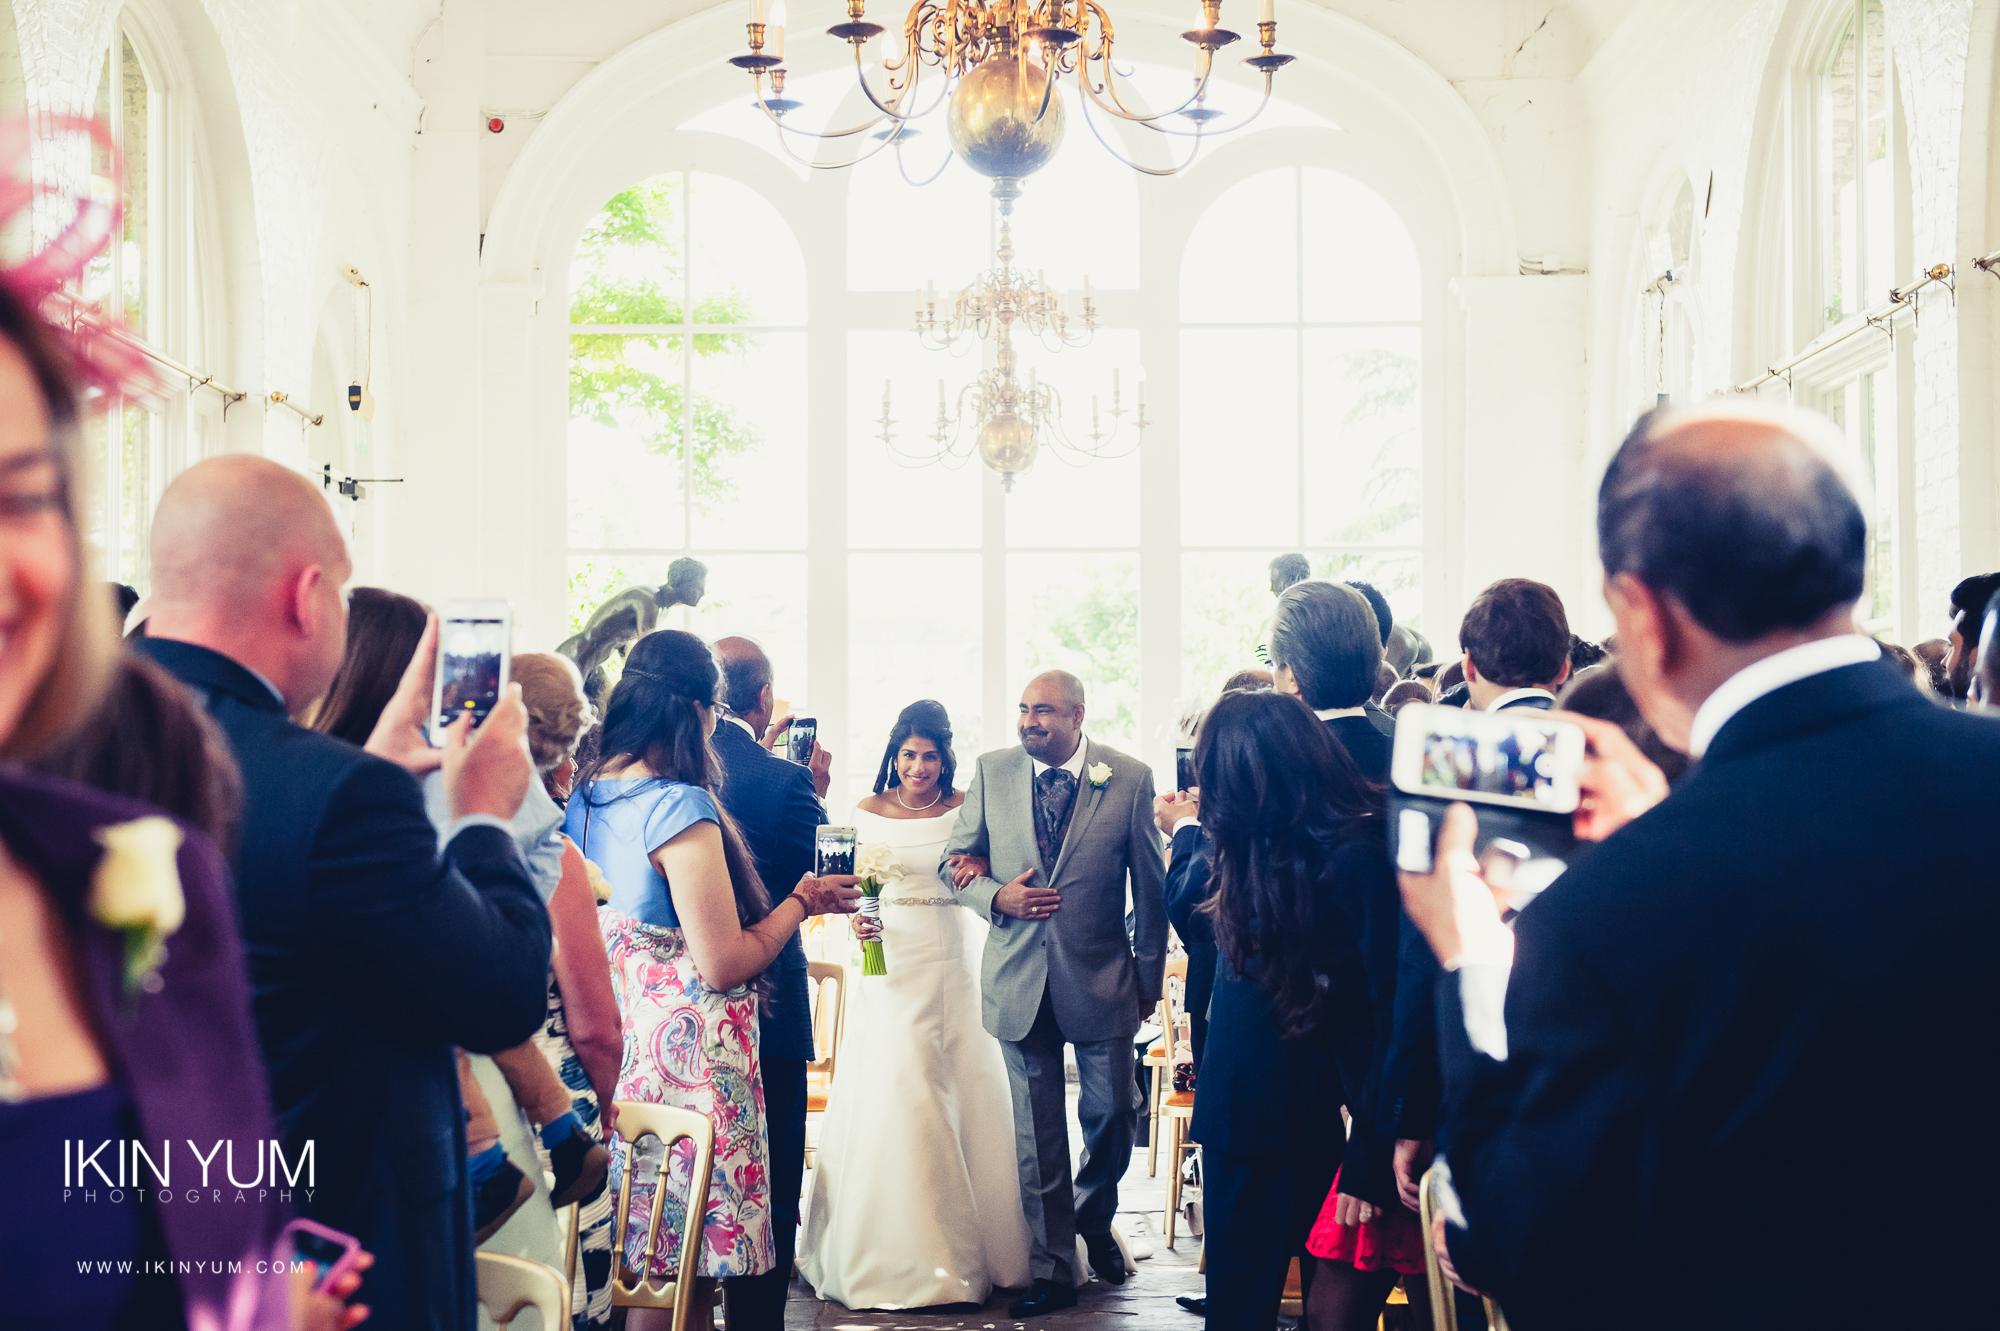 Holland Park Wedding - Ikin Yum Photography-0027.jpg